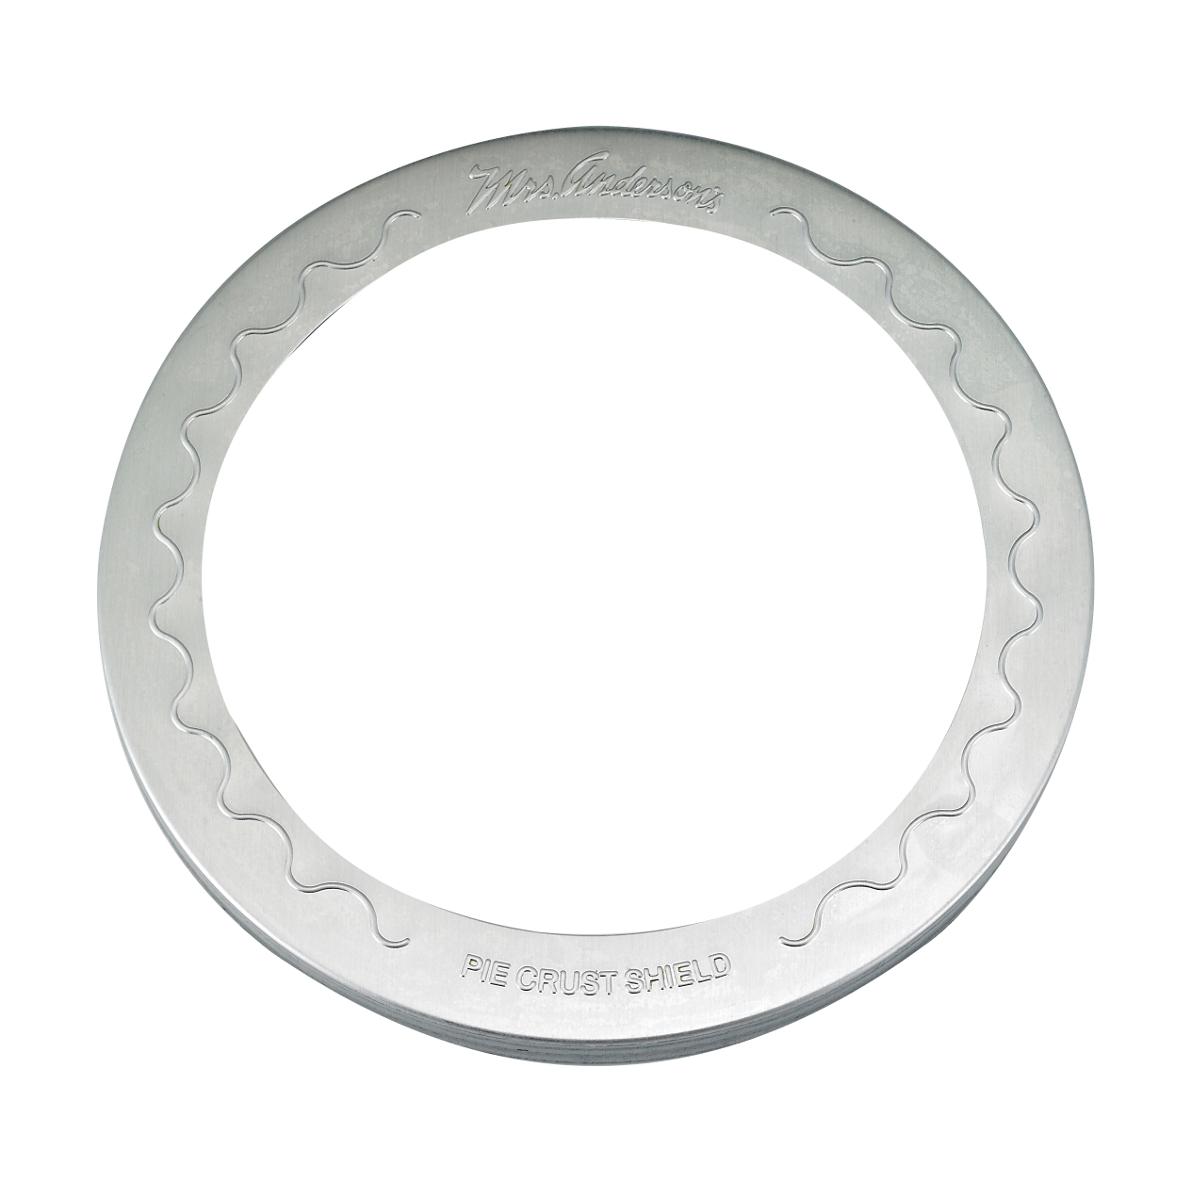 Mrs. Anderson's Baking Aluminum 9 Inch Reusable Pie Crust Shield